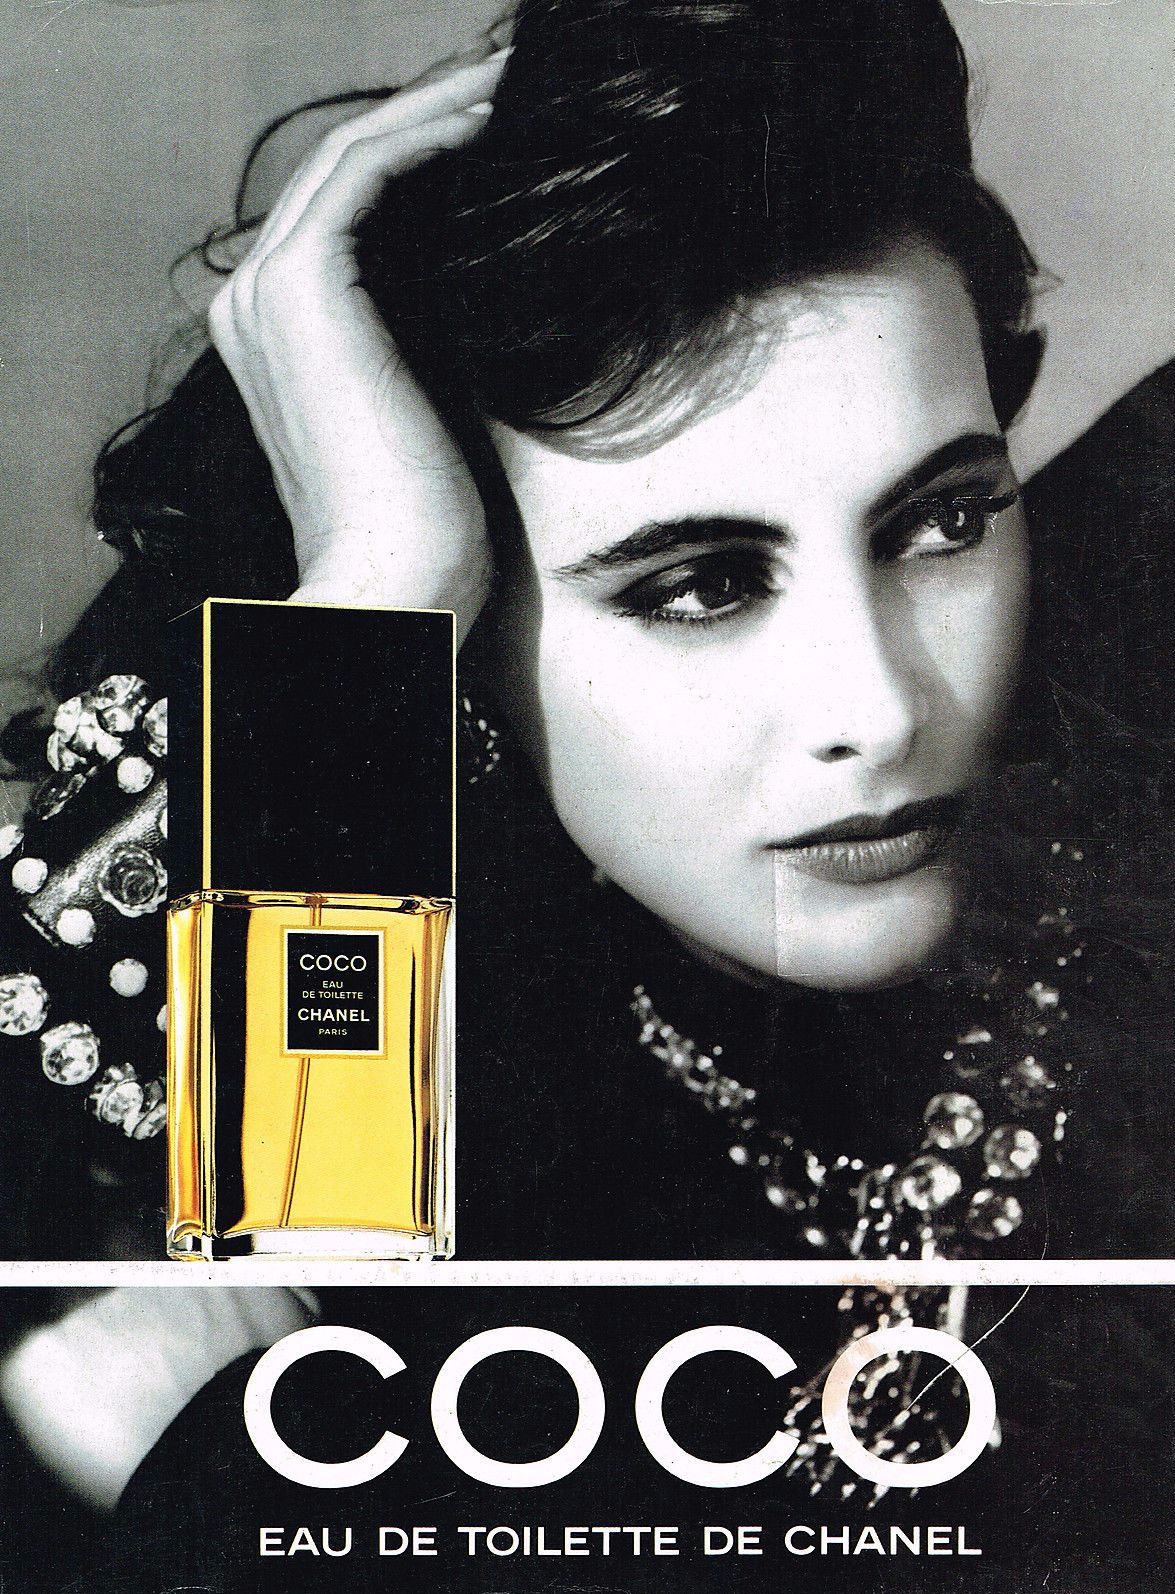 1989-ines-de-la-fressange-coco-chanel.jpg